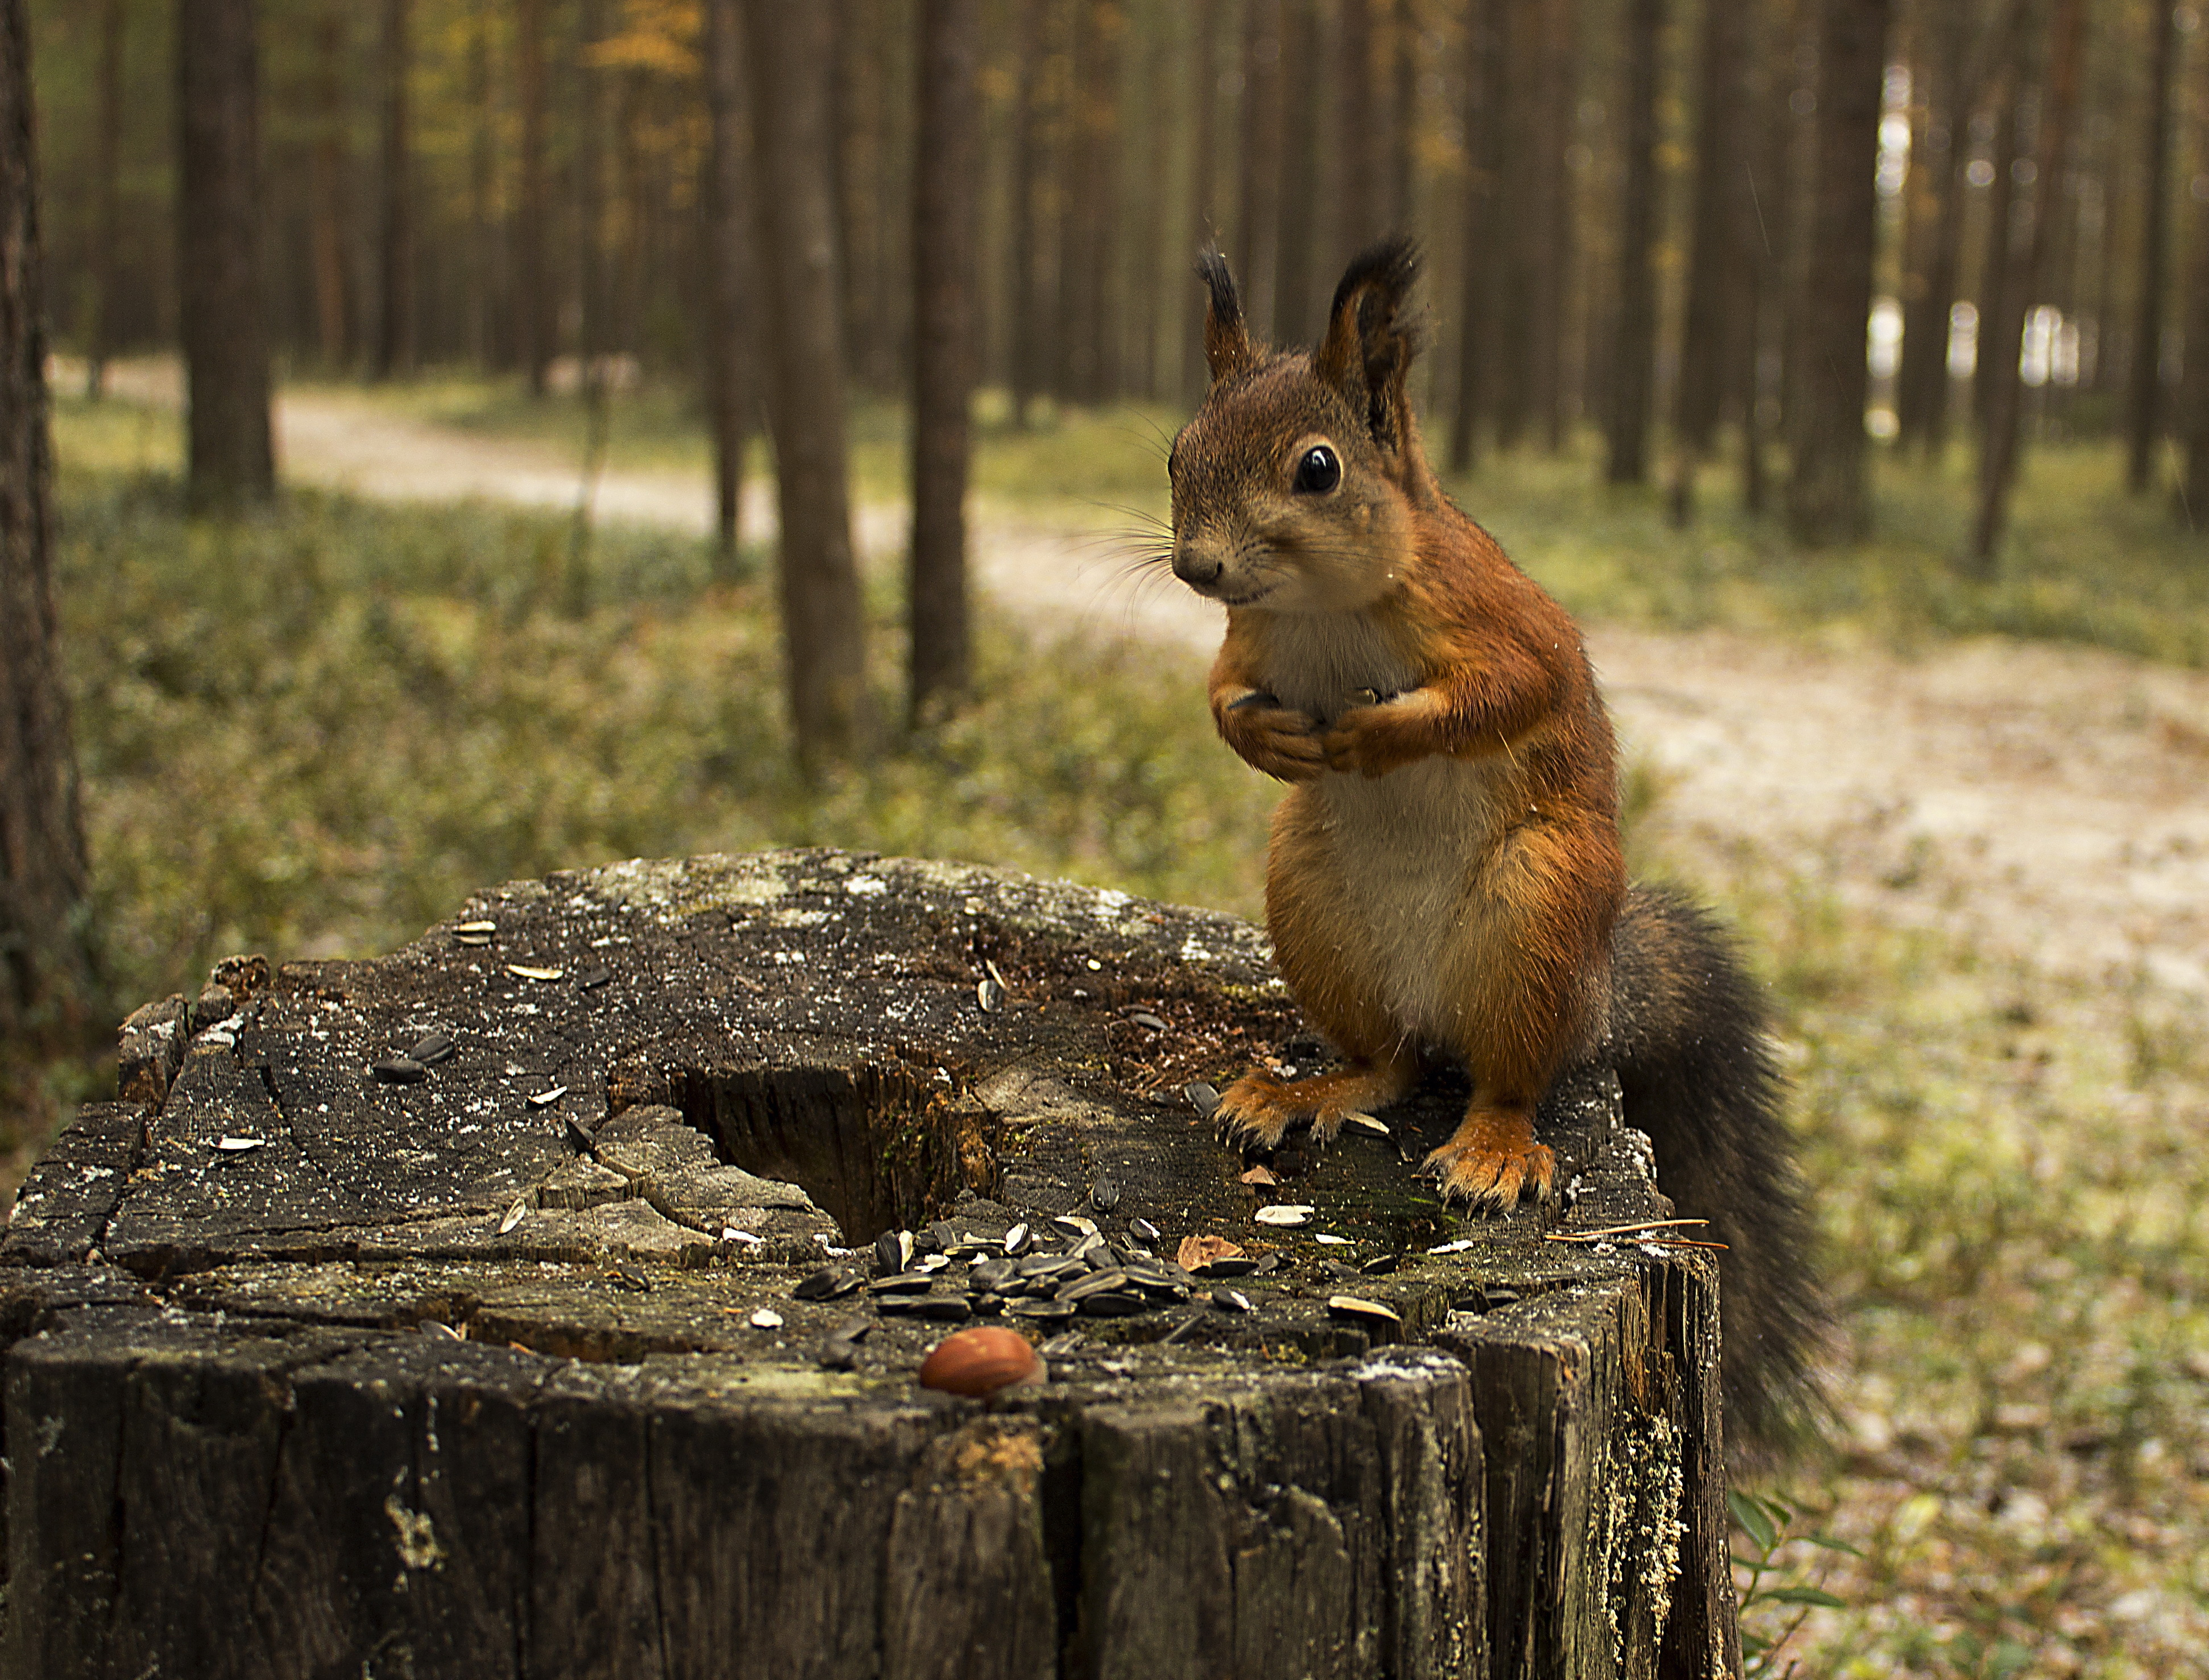 природа осень животное корзина семечки белка  № 2096038 загрузить